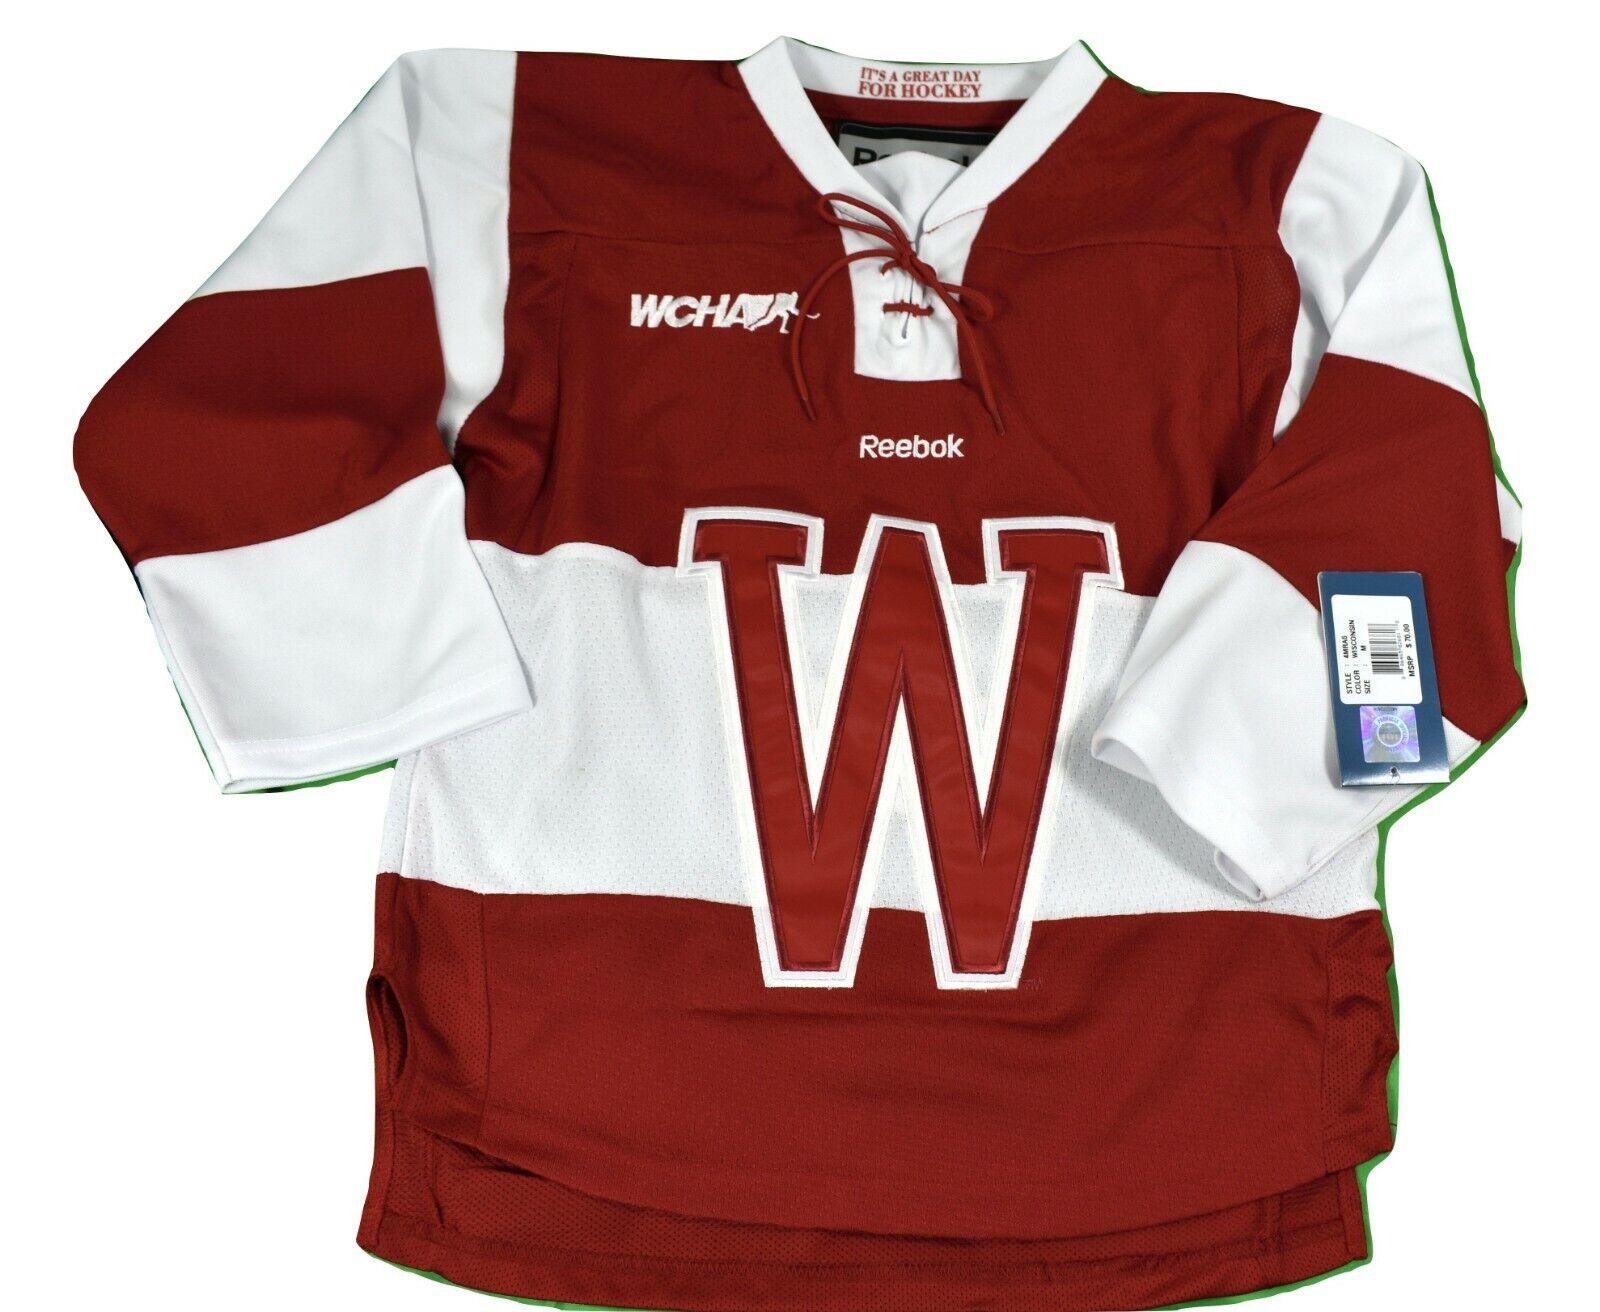 Reebok WCHA Wisconsin Badgers Premier Sewn Youth Hockey